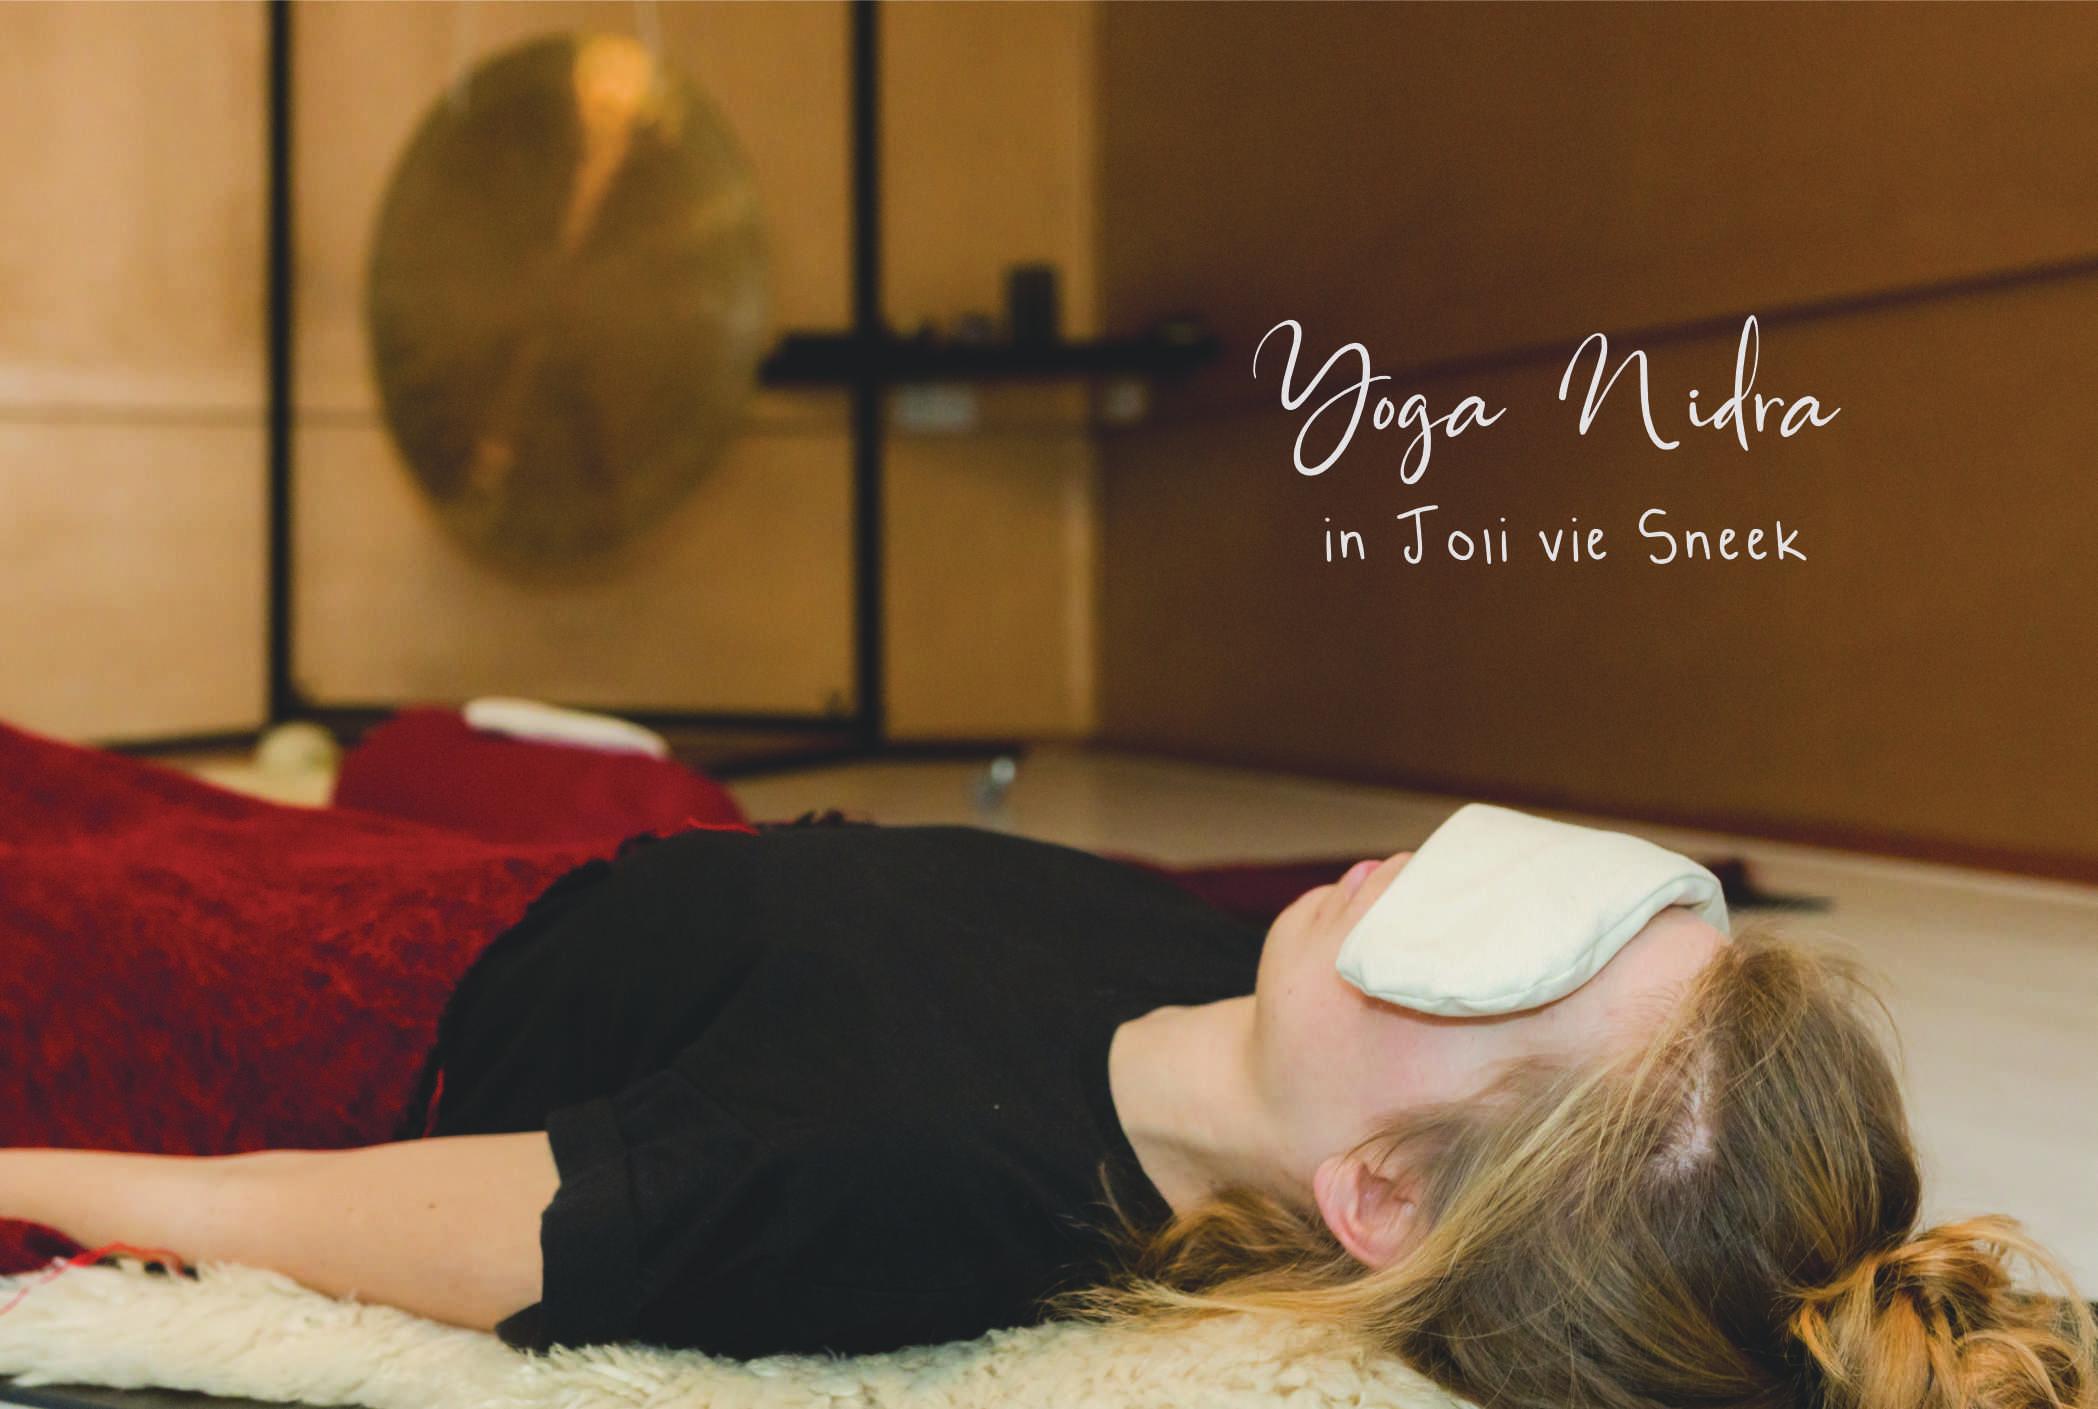 Yoga Nidra Sneek Joli Vie